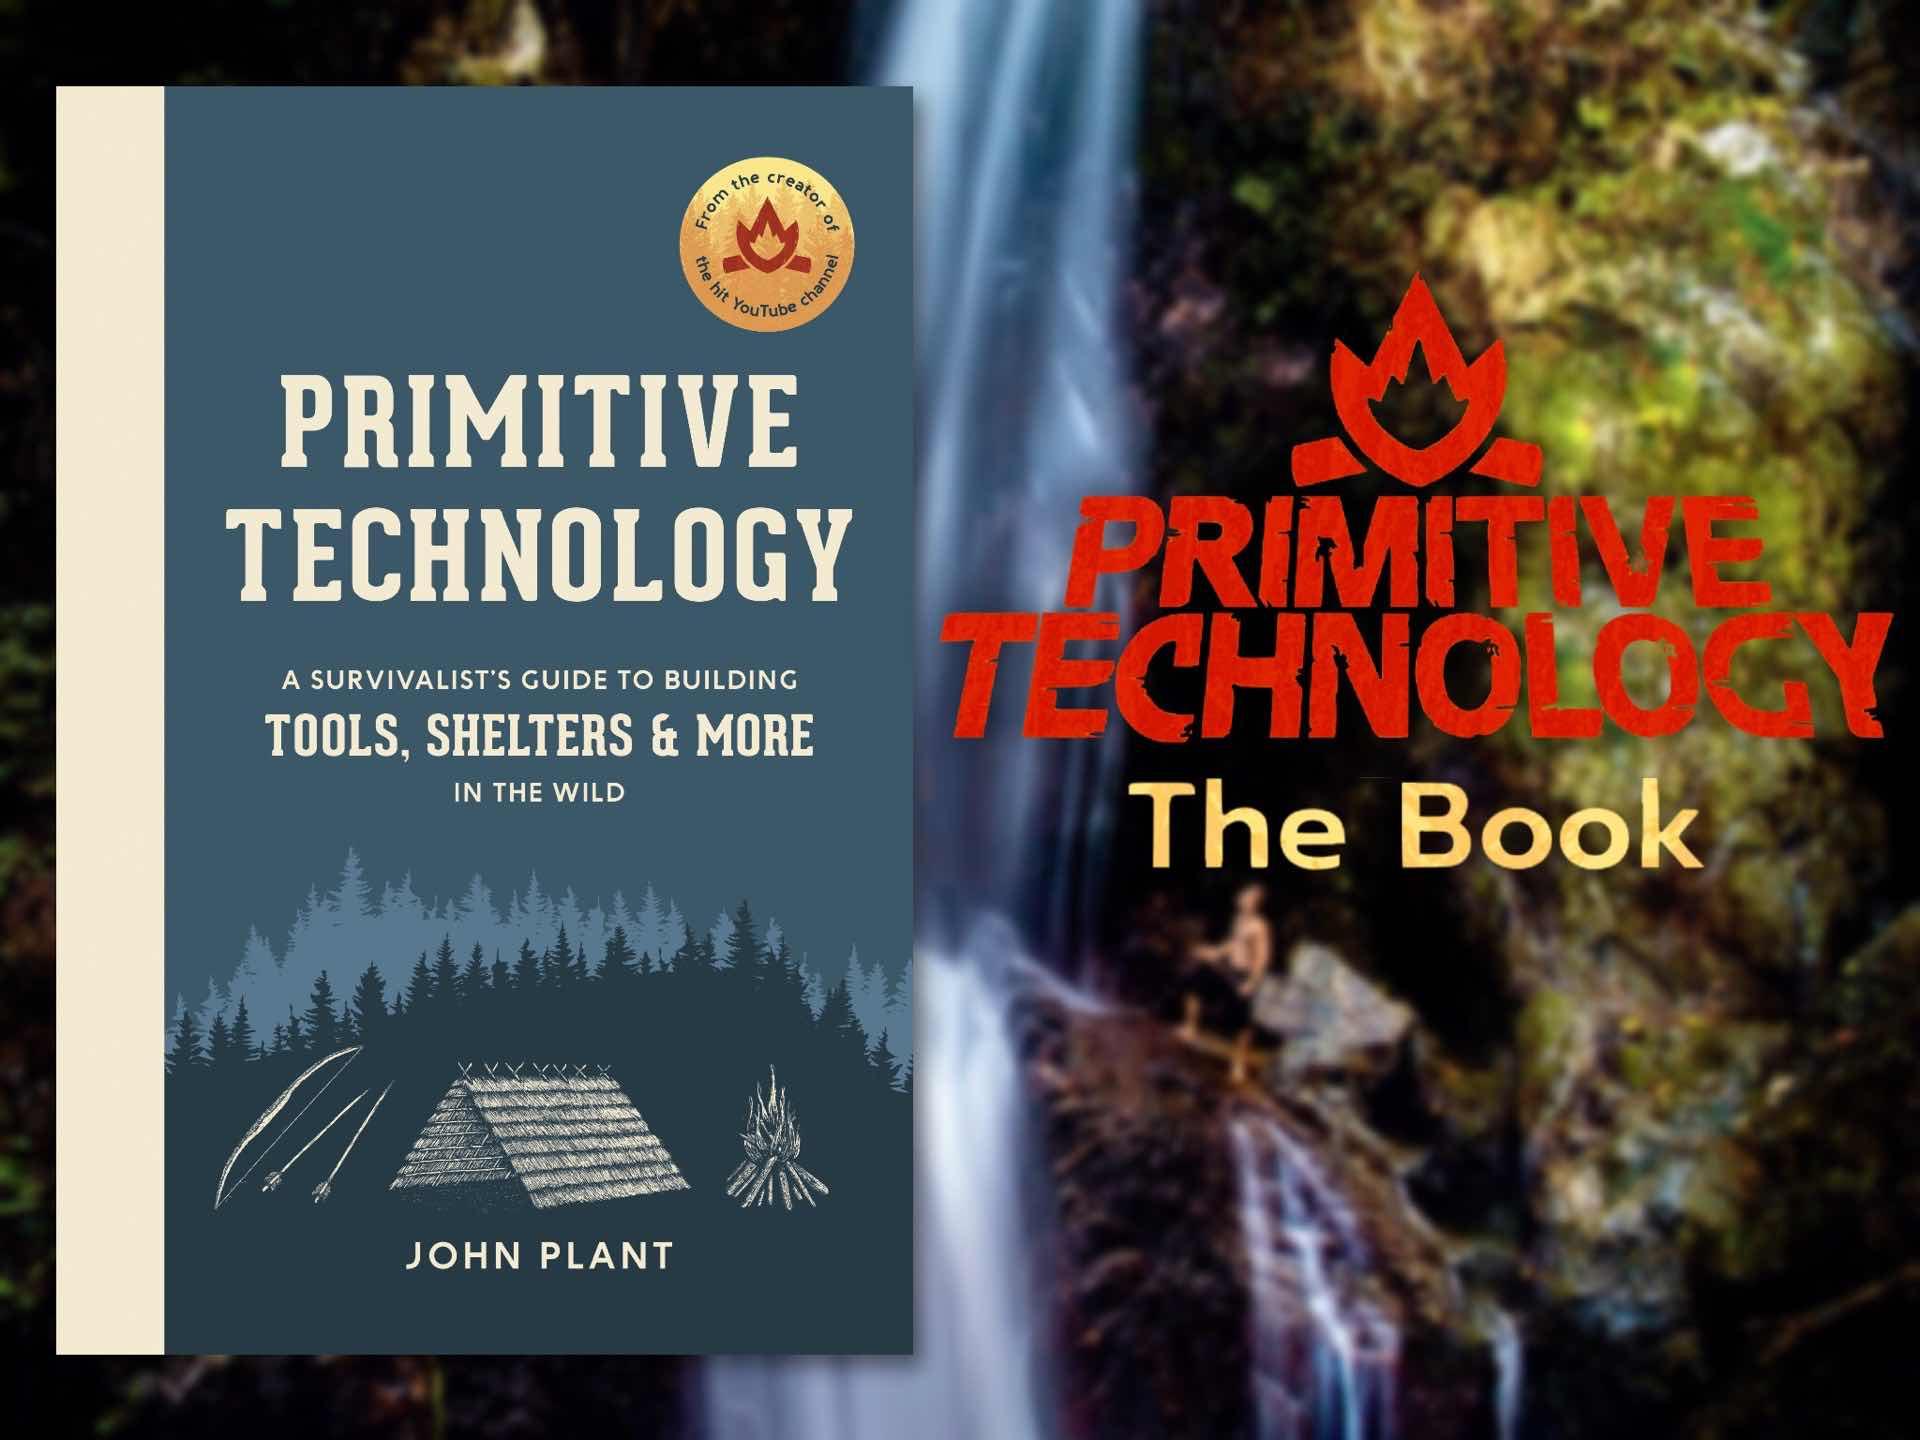 primitive-technology-book-by-john-plant